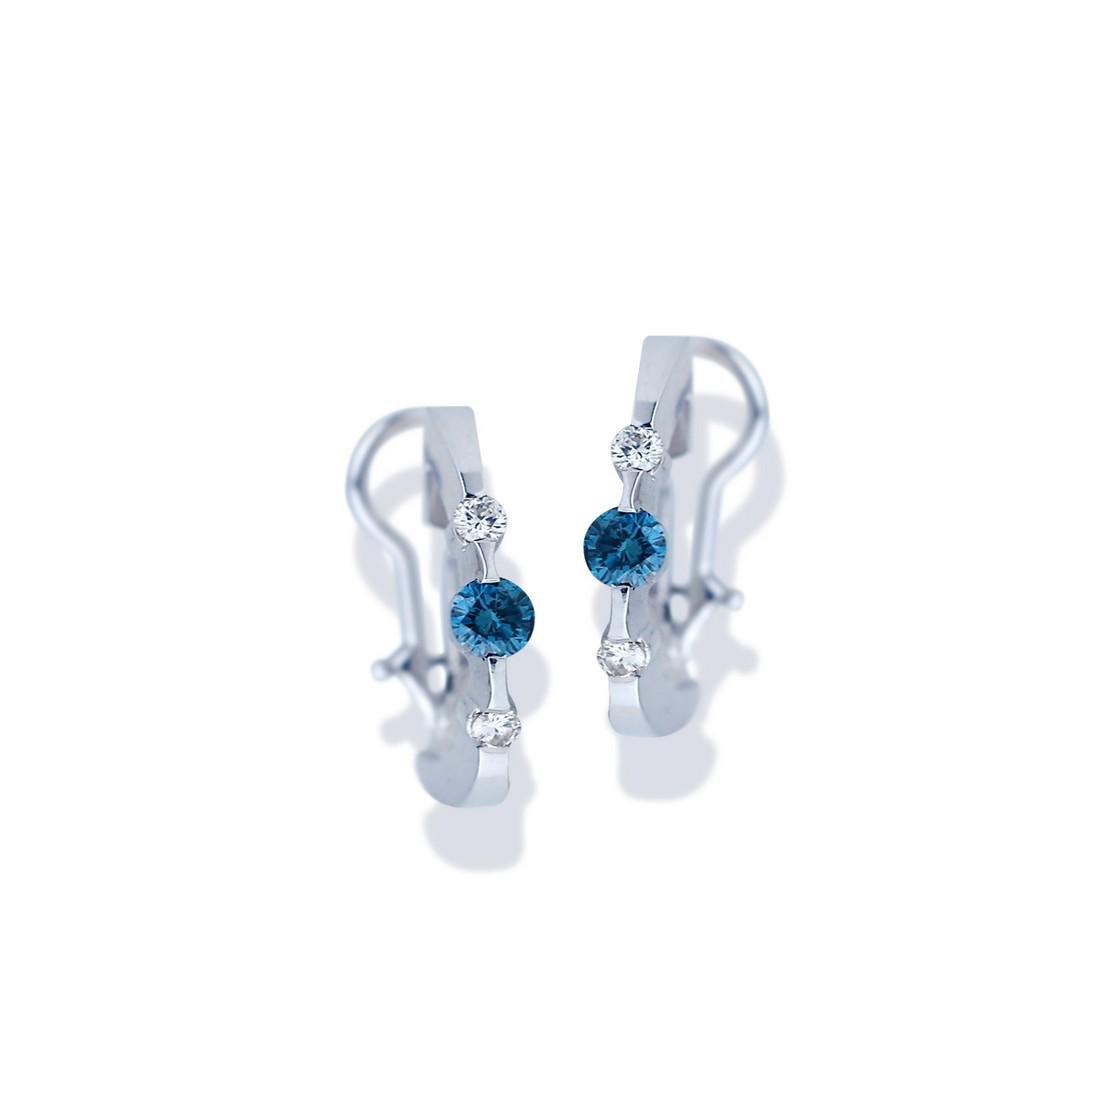 Blue Diamonds, 1.07 Carat, Hoop Earrings, White gold